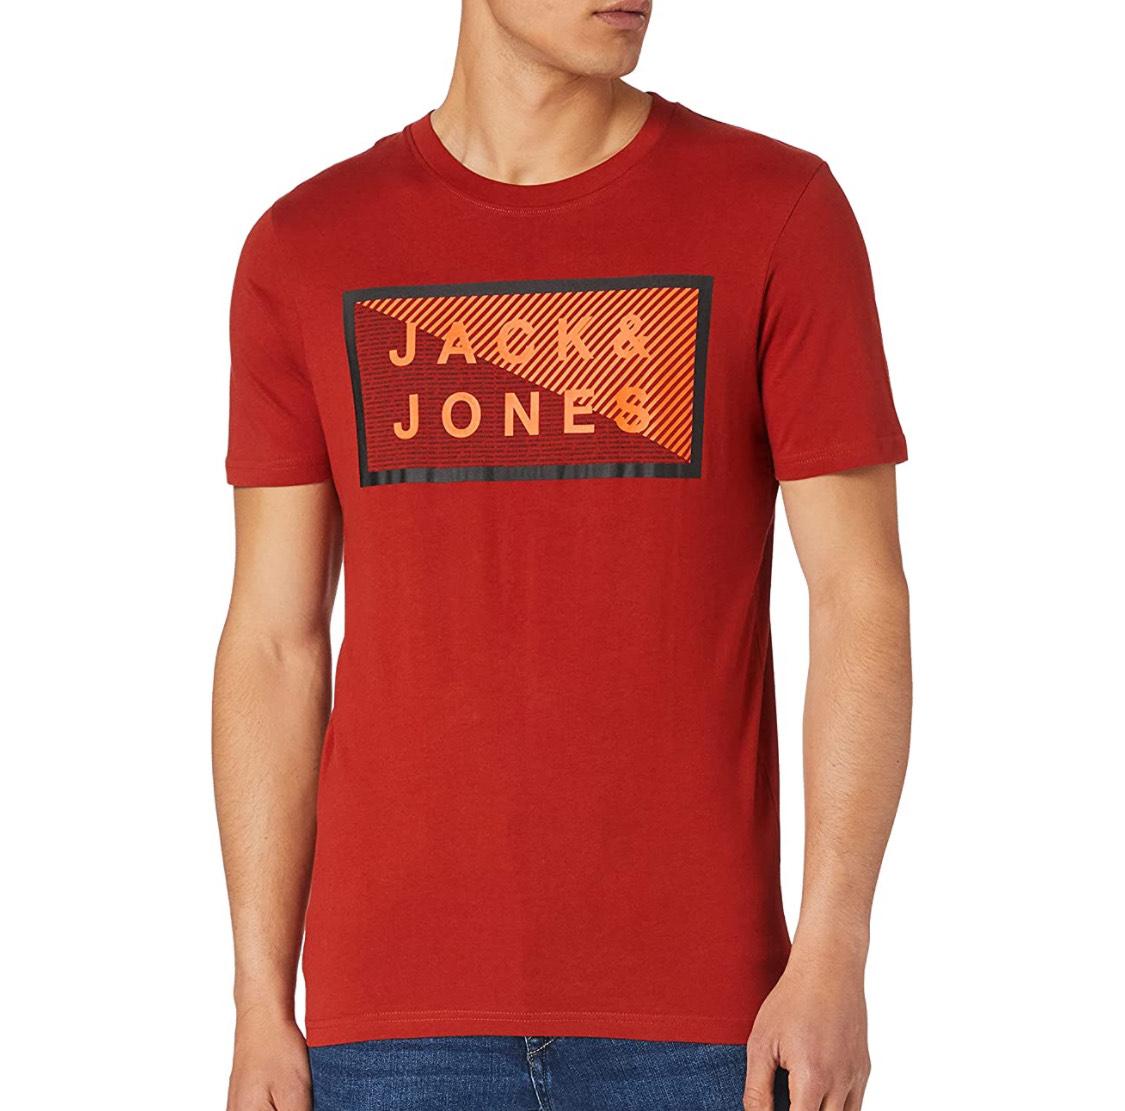 Camiseta entallada Jack & Jones hombre talla XL.